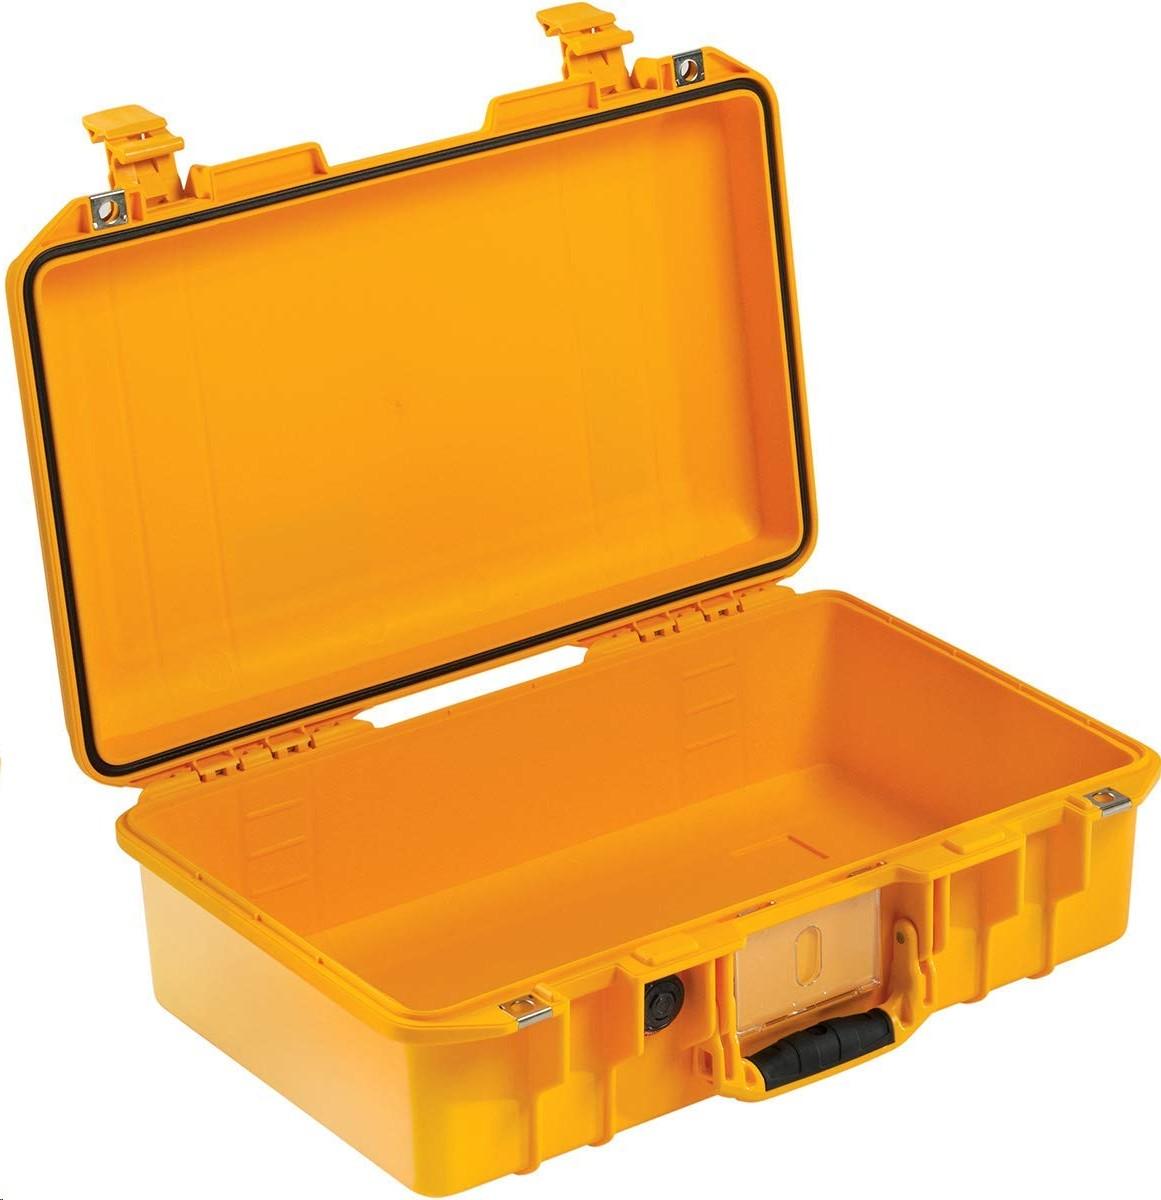 Pelican Air 1485 Case No Foam (Yellow) 014850-0010-240